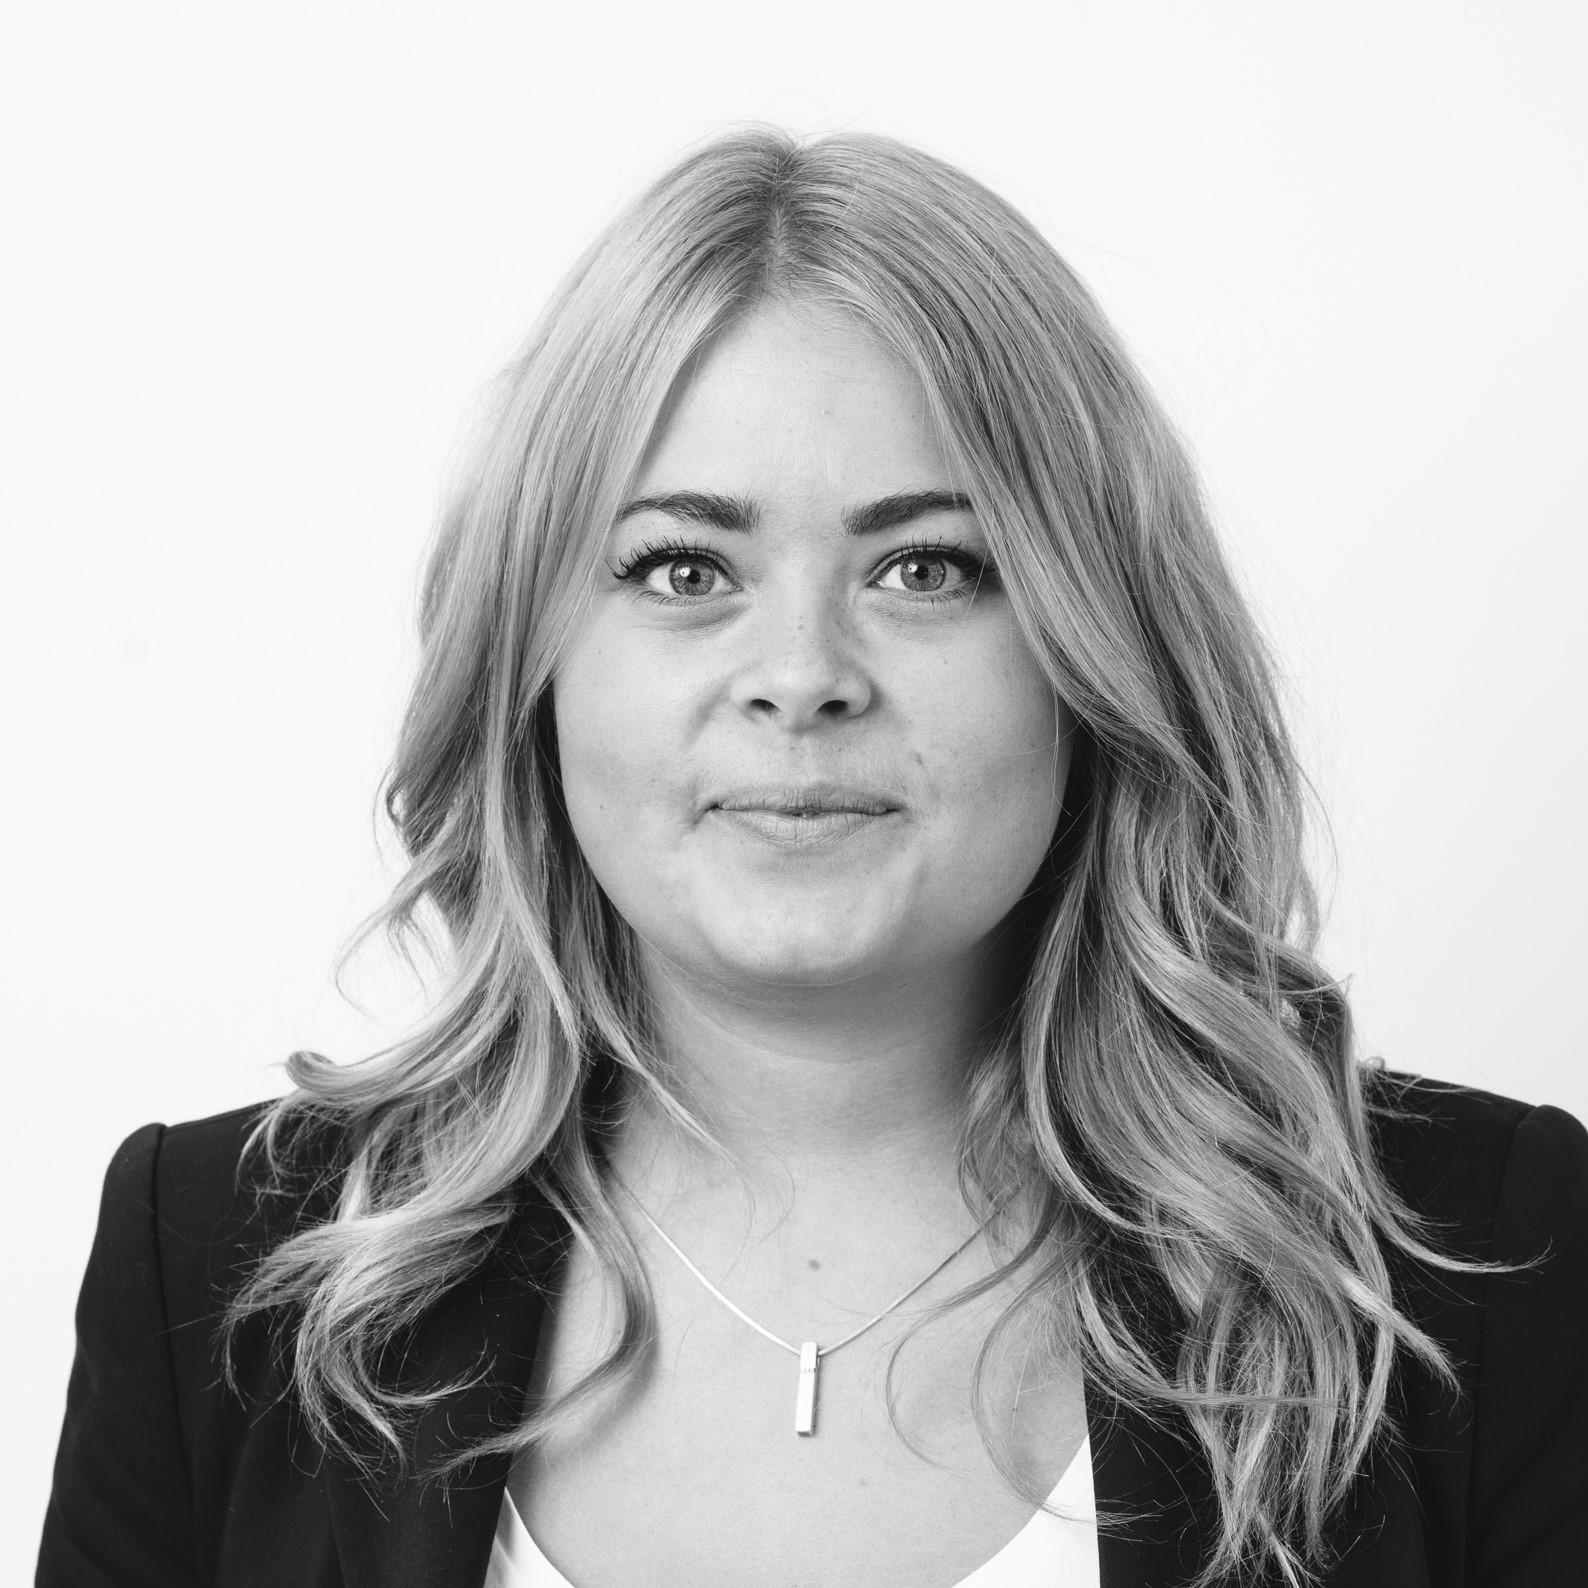 Amanda Öberg